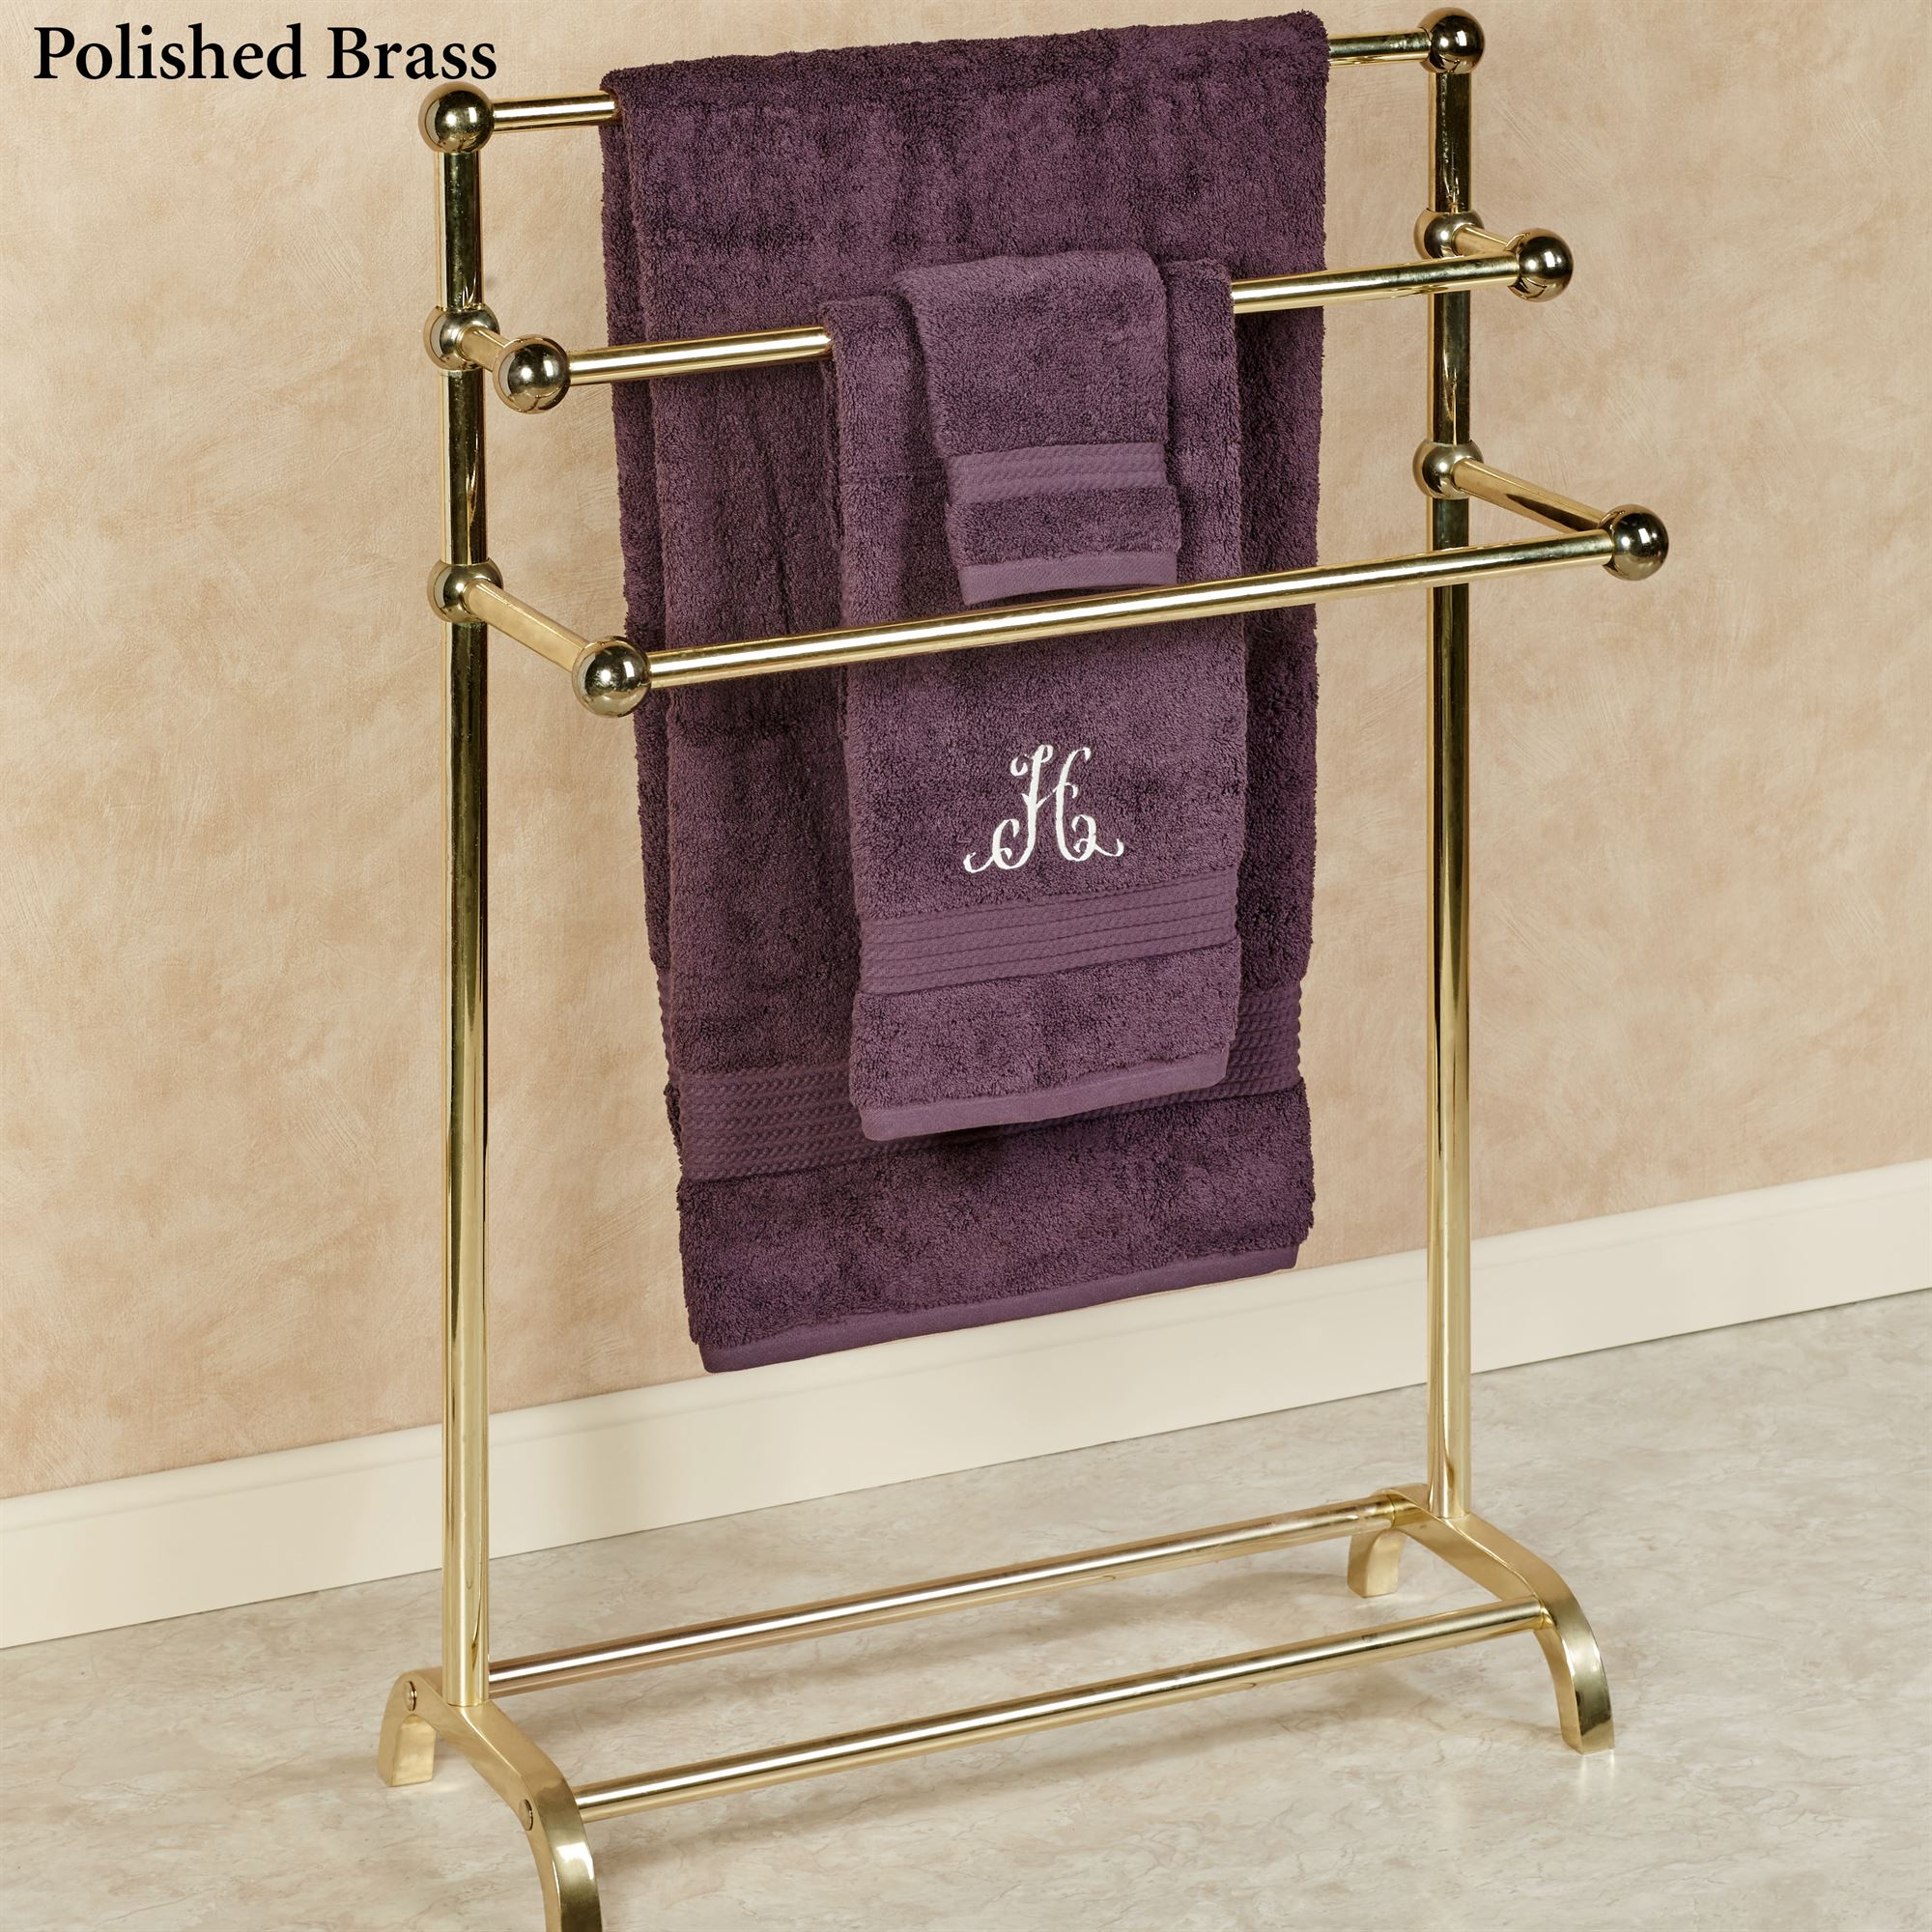 Three Tier Towel Rack